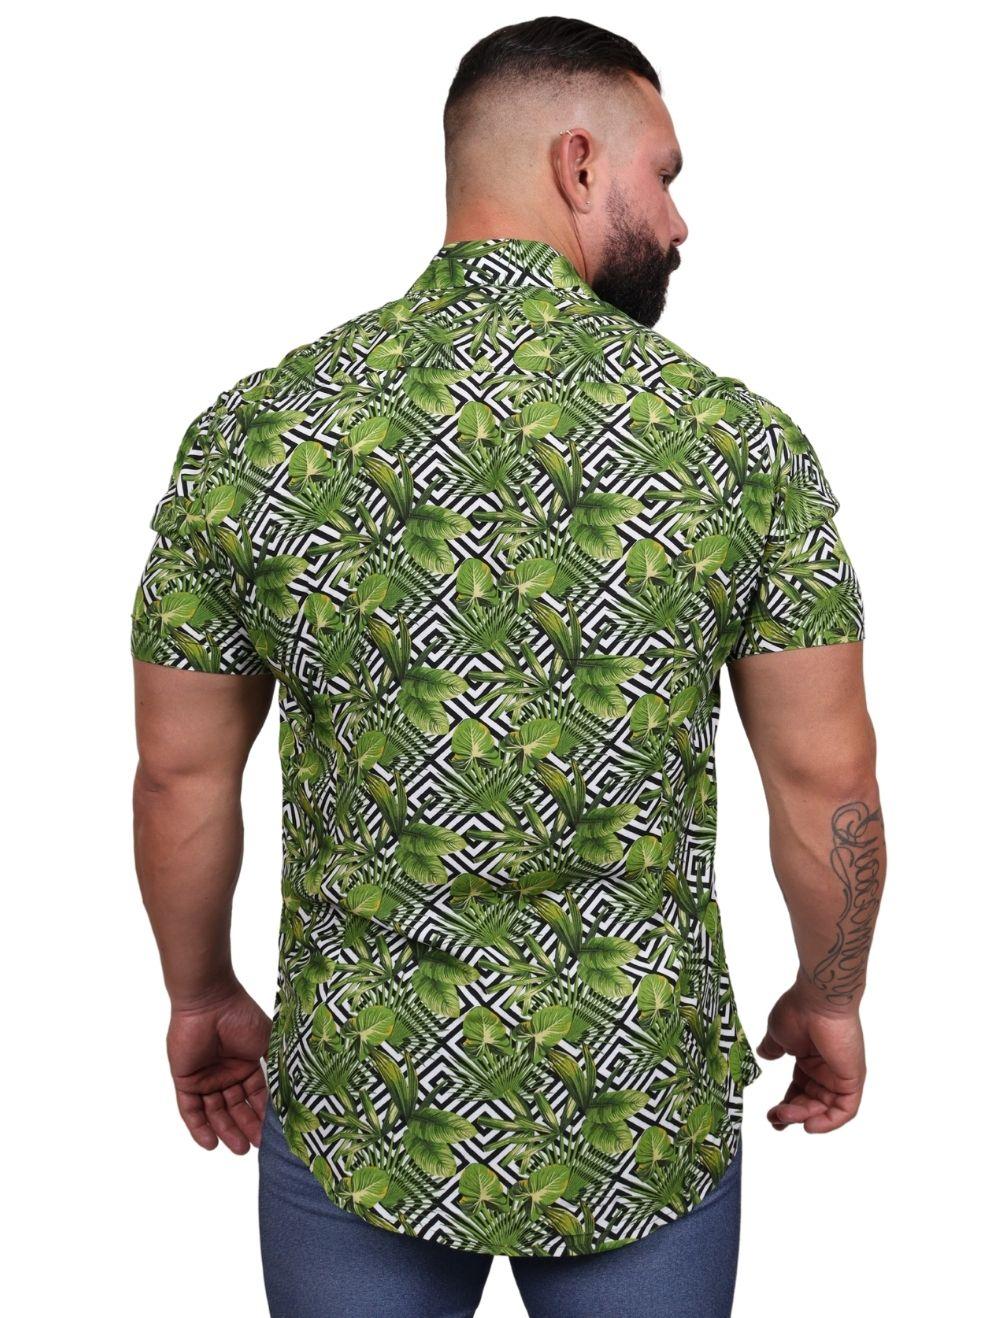 Camisa Masculina Slim Manga Curta Verde Floral